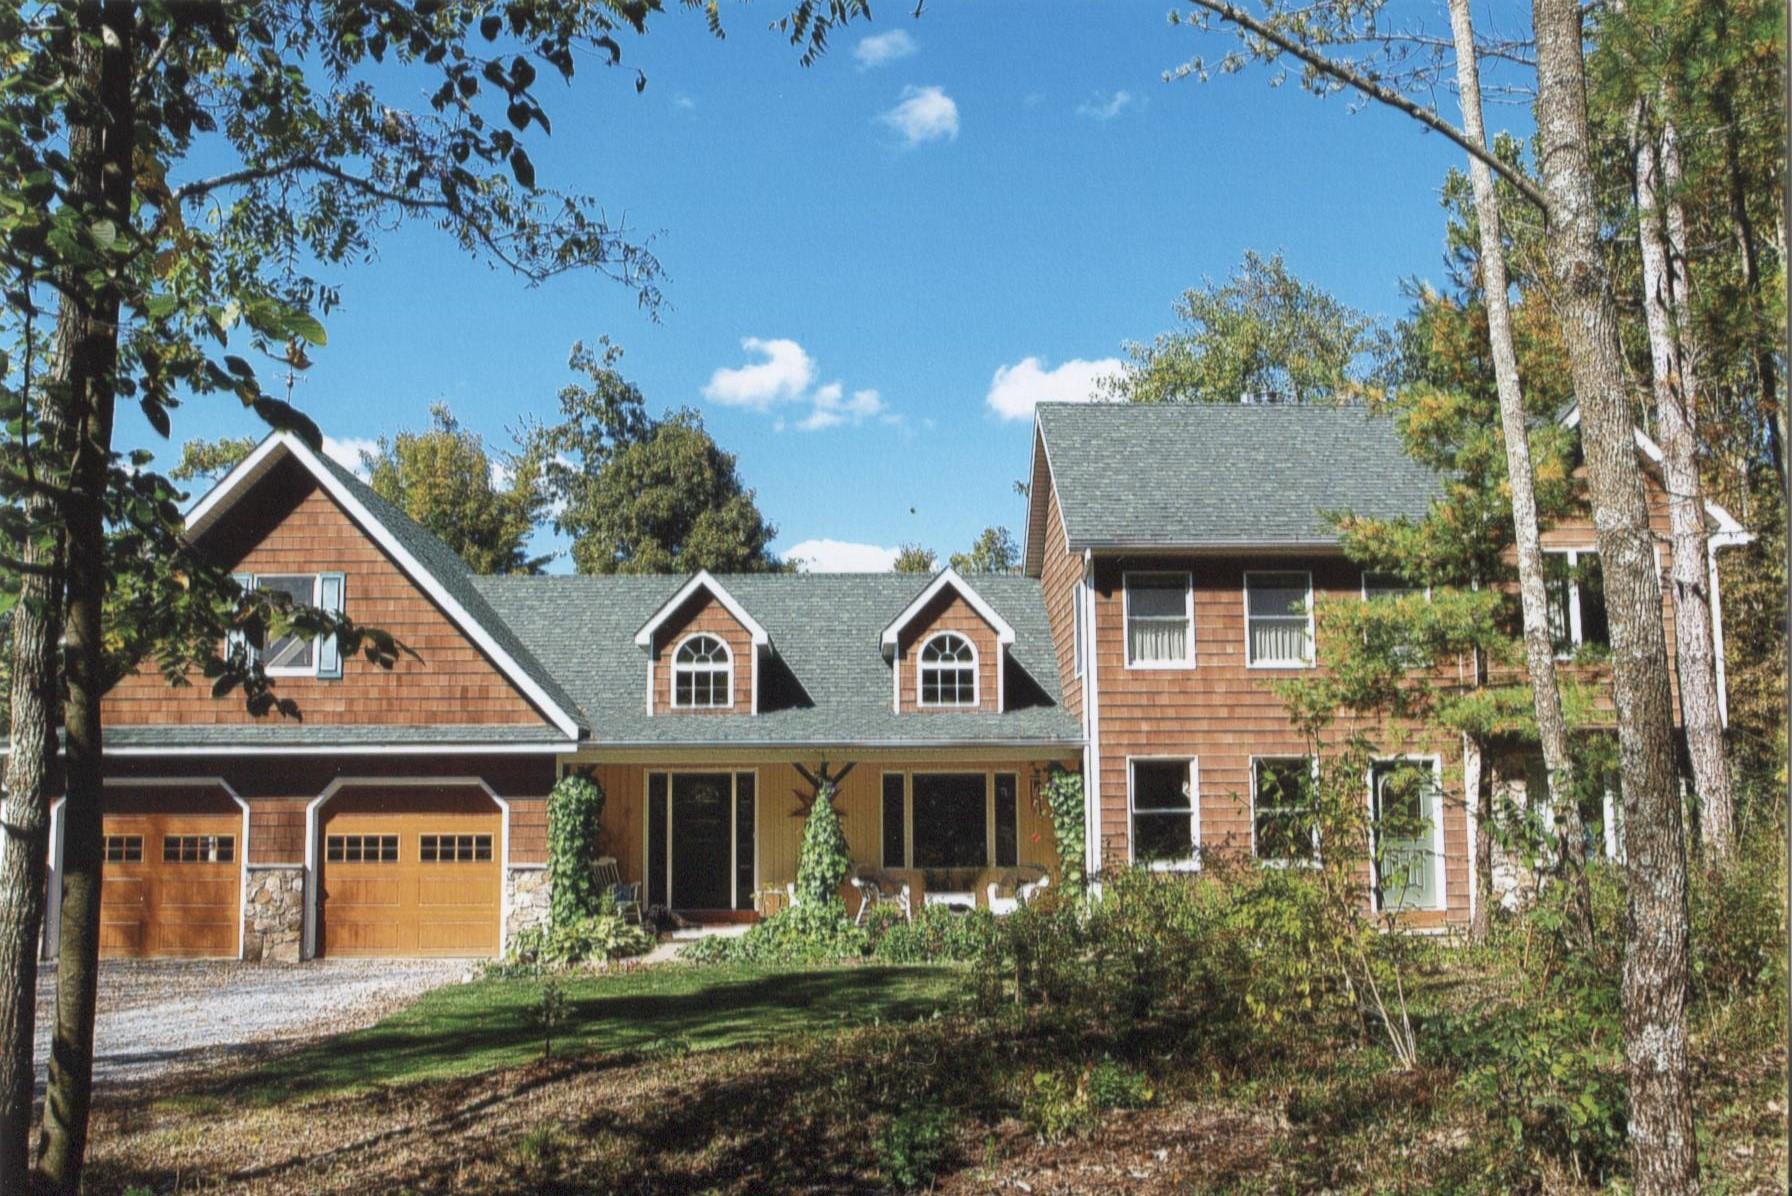 572 Pardee Road, Millmont, Pennsylvania 17845